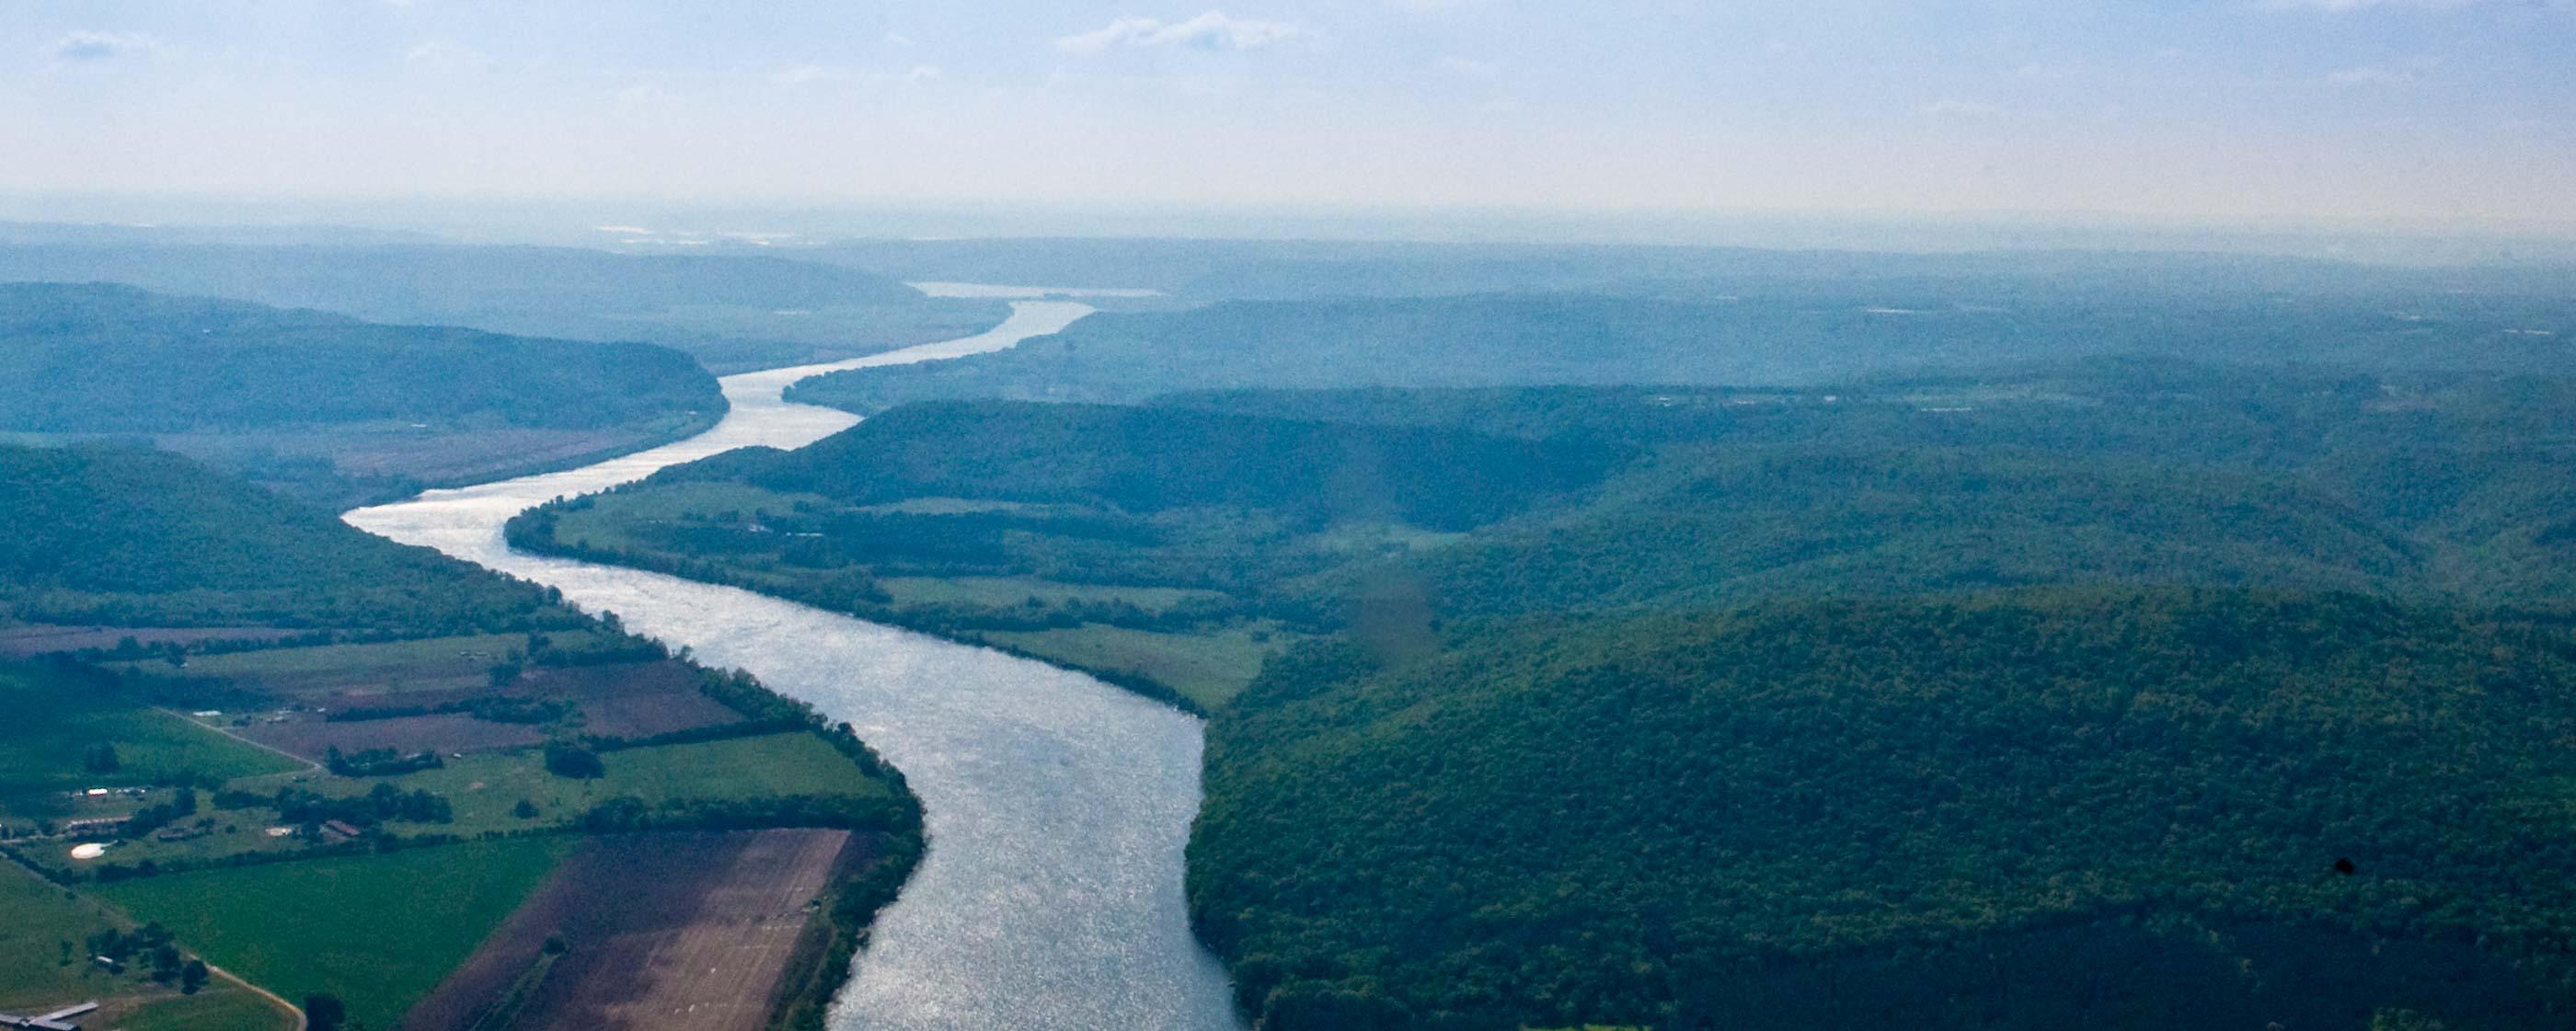 TVA - Managing the River